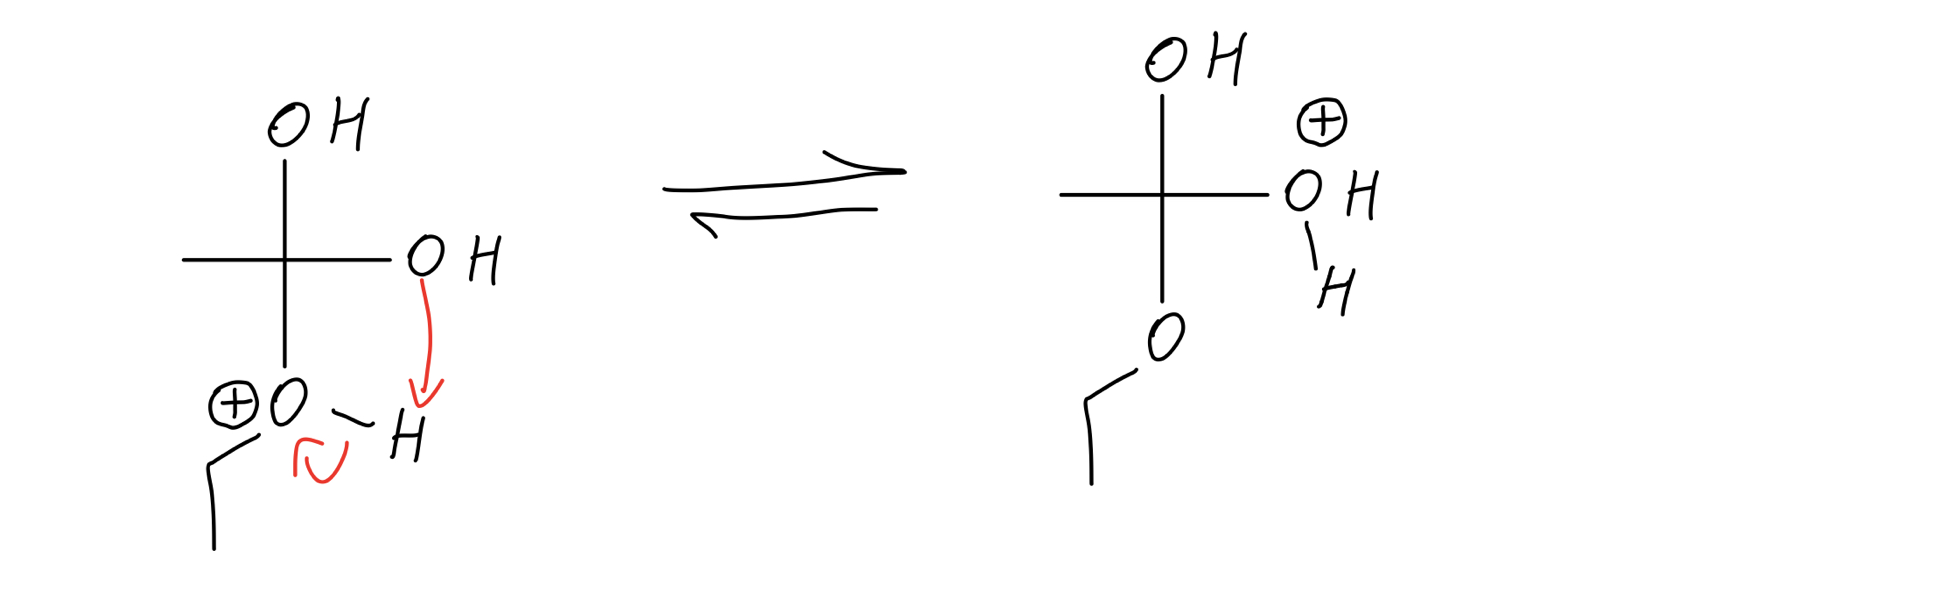 Proton-transfer